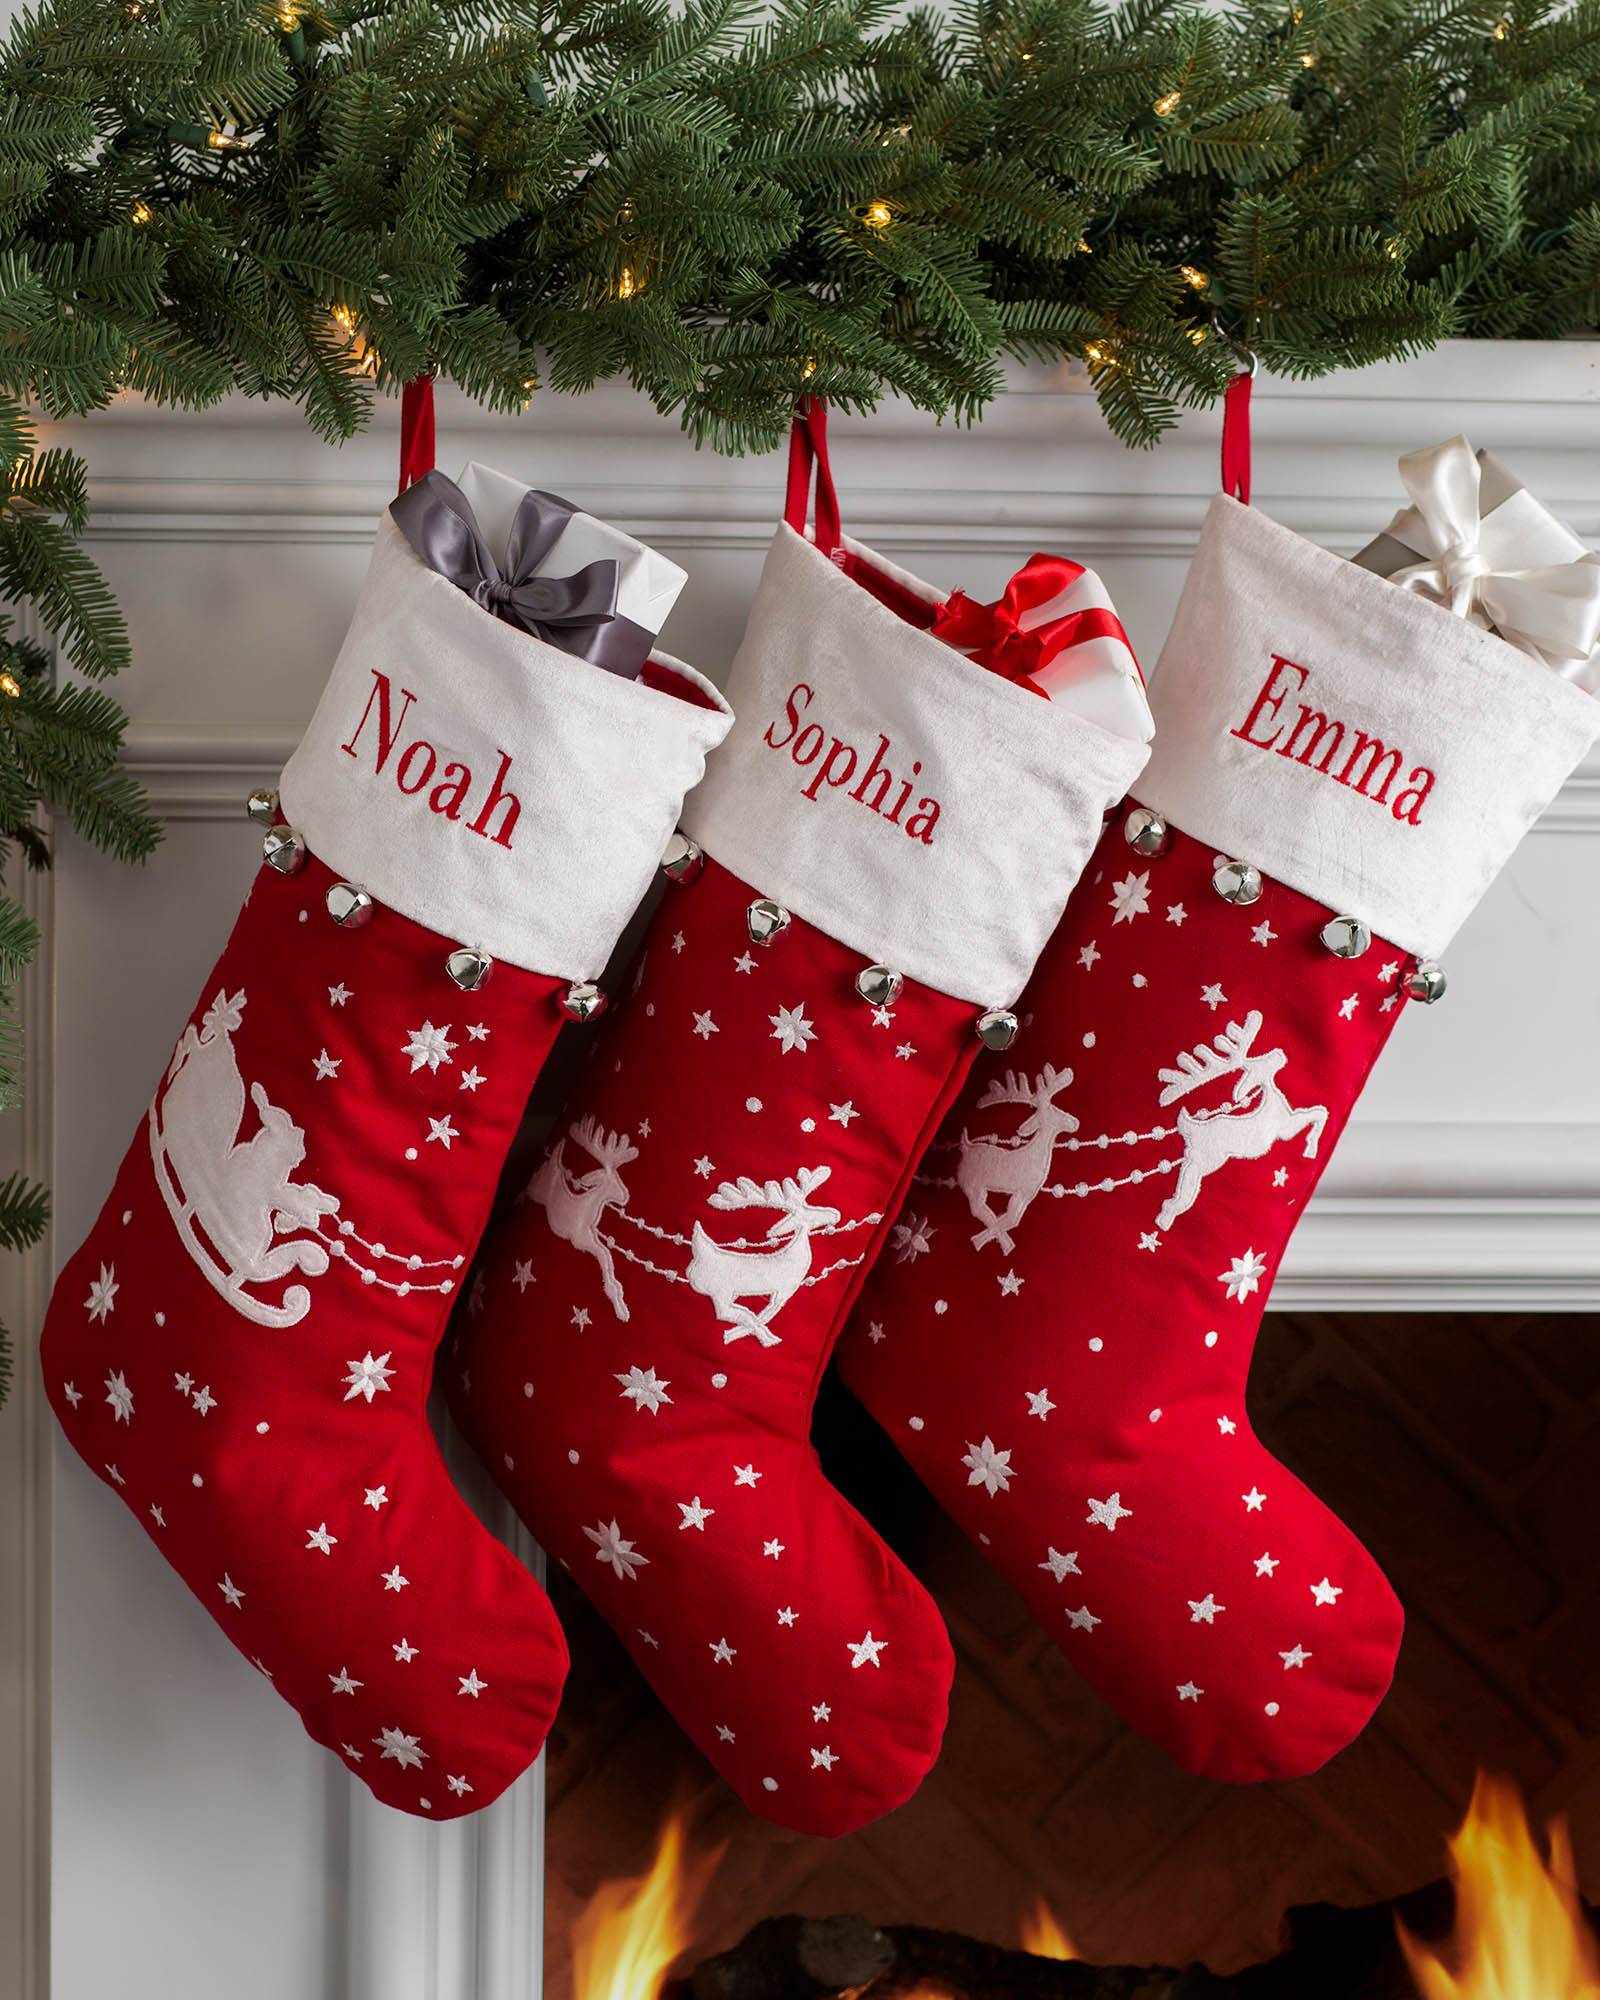 Family Christmas Stockings.Dashing Through The Snow Stocking Balsam Hill